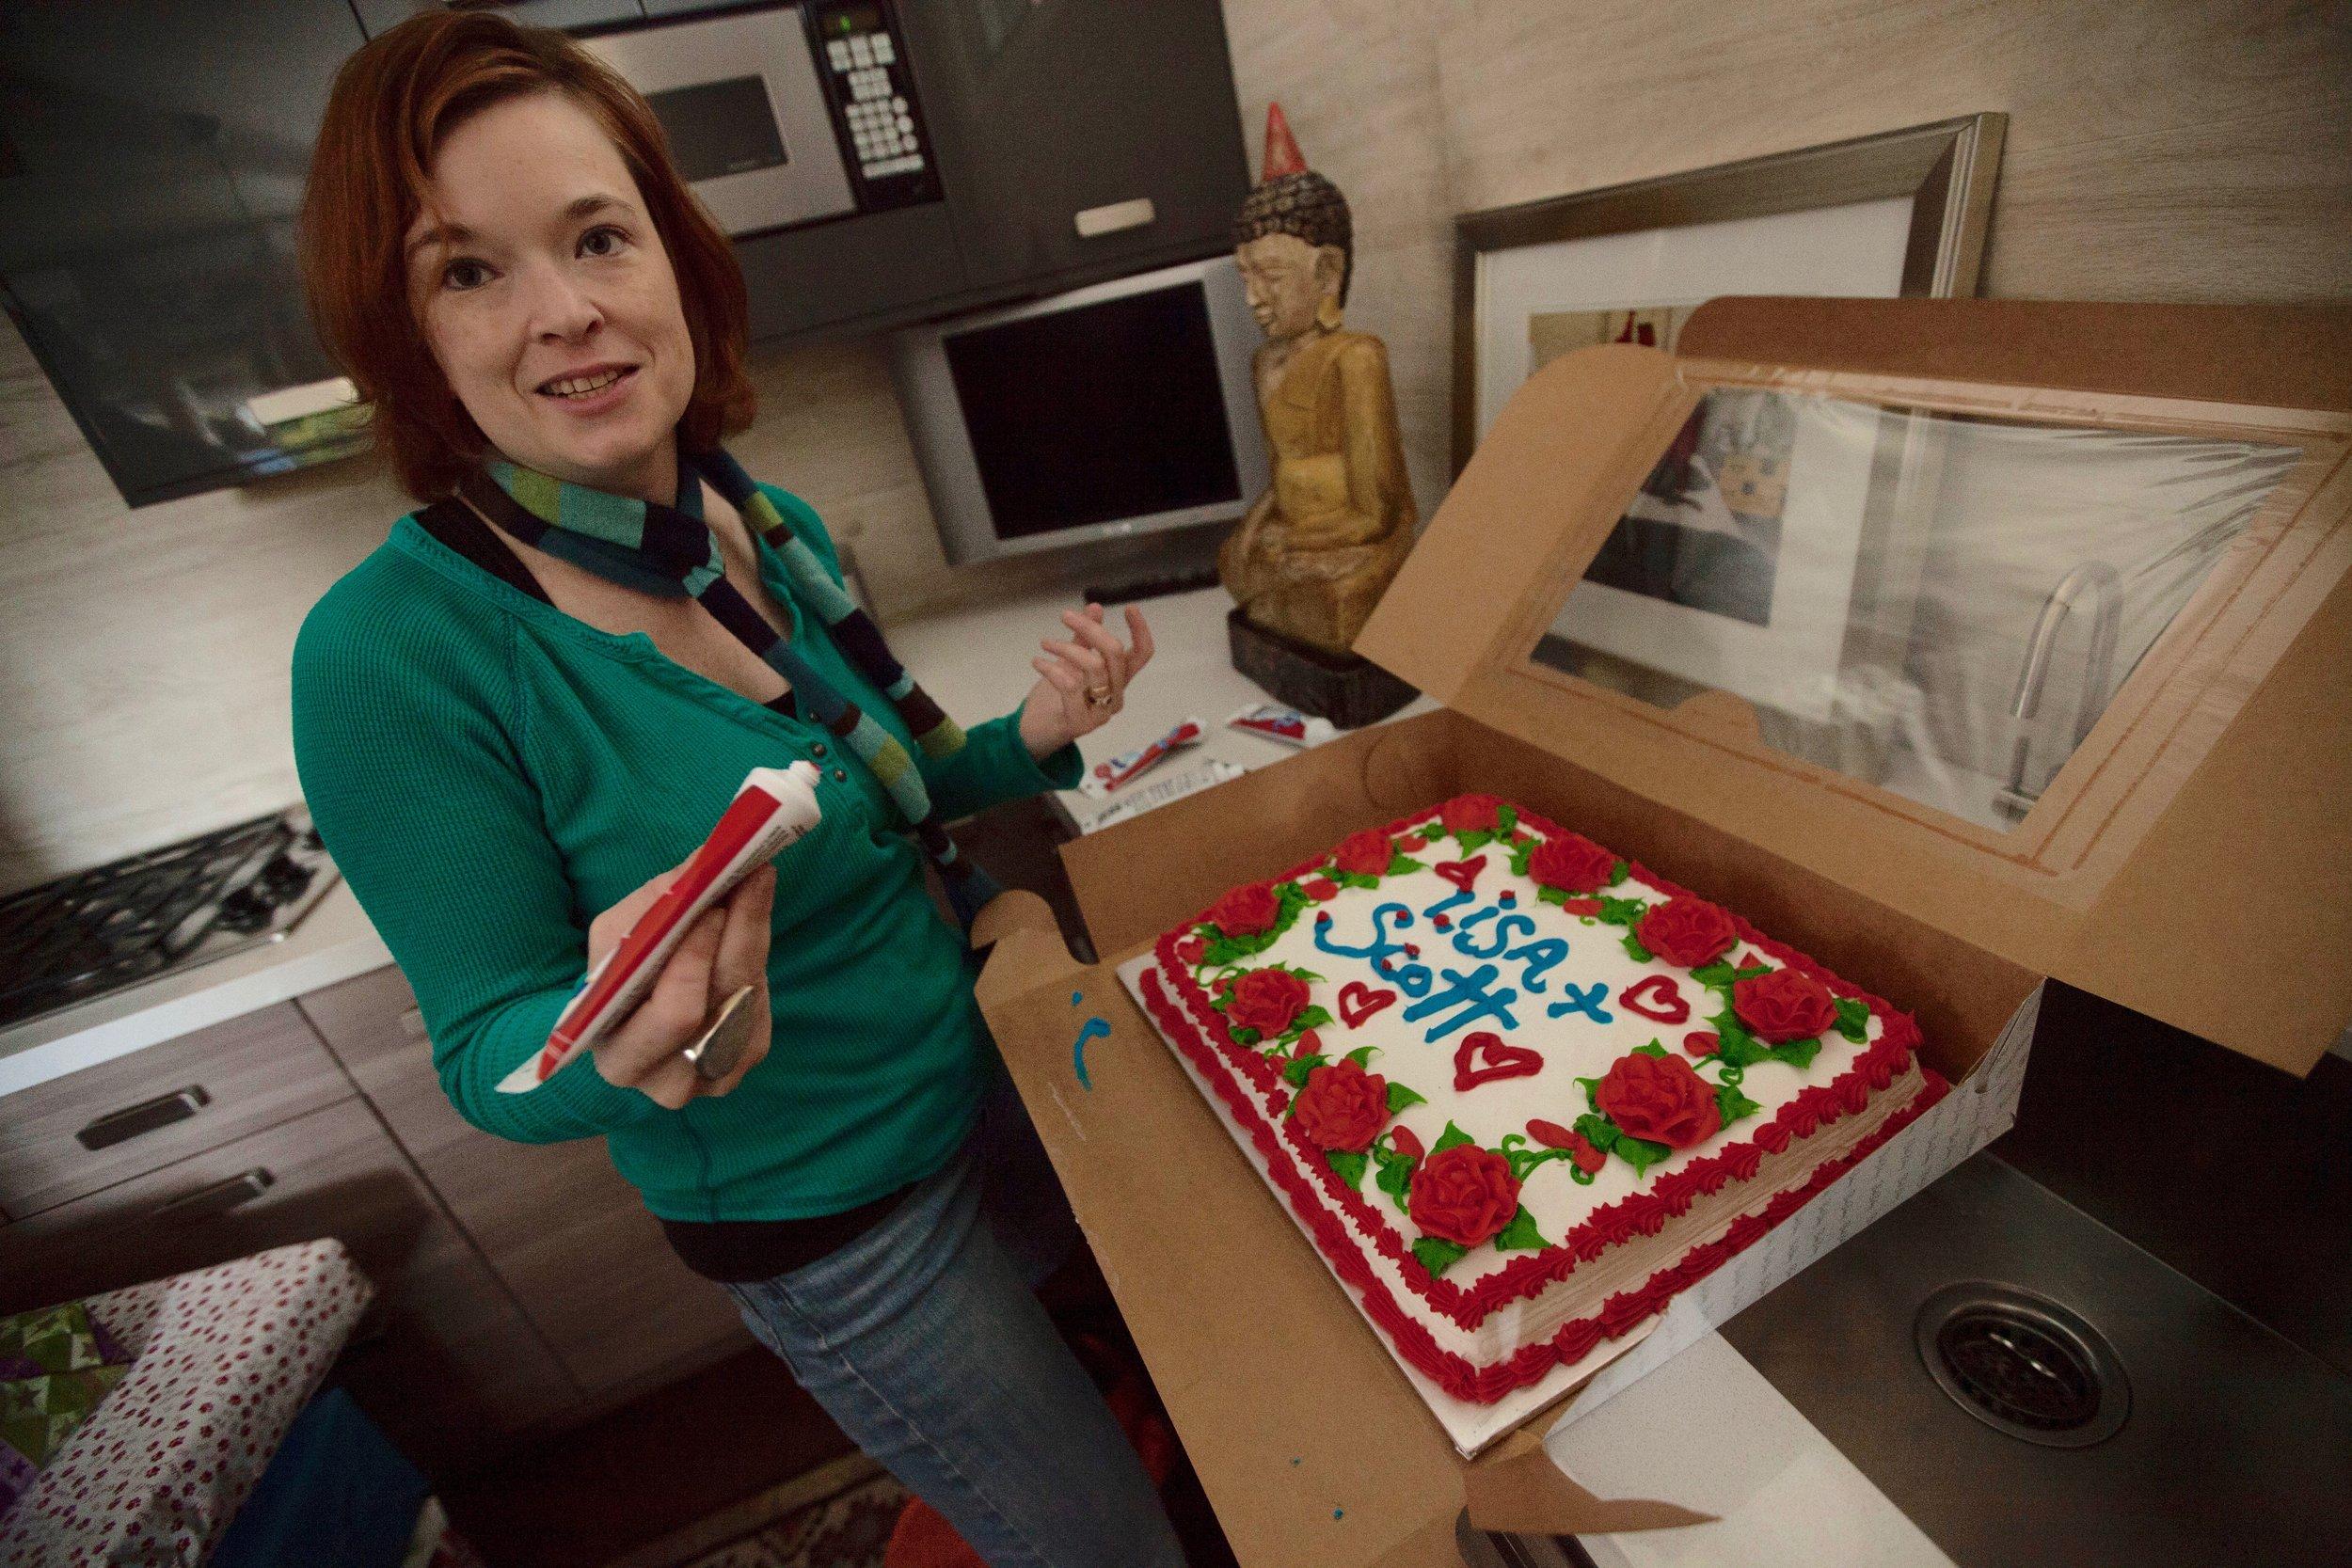 1/17/16 Garden Party Scene. Exec. Prod. Corinne Marrinan ices the cake.